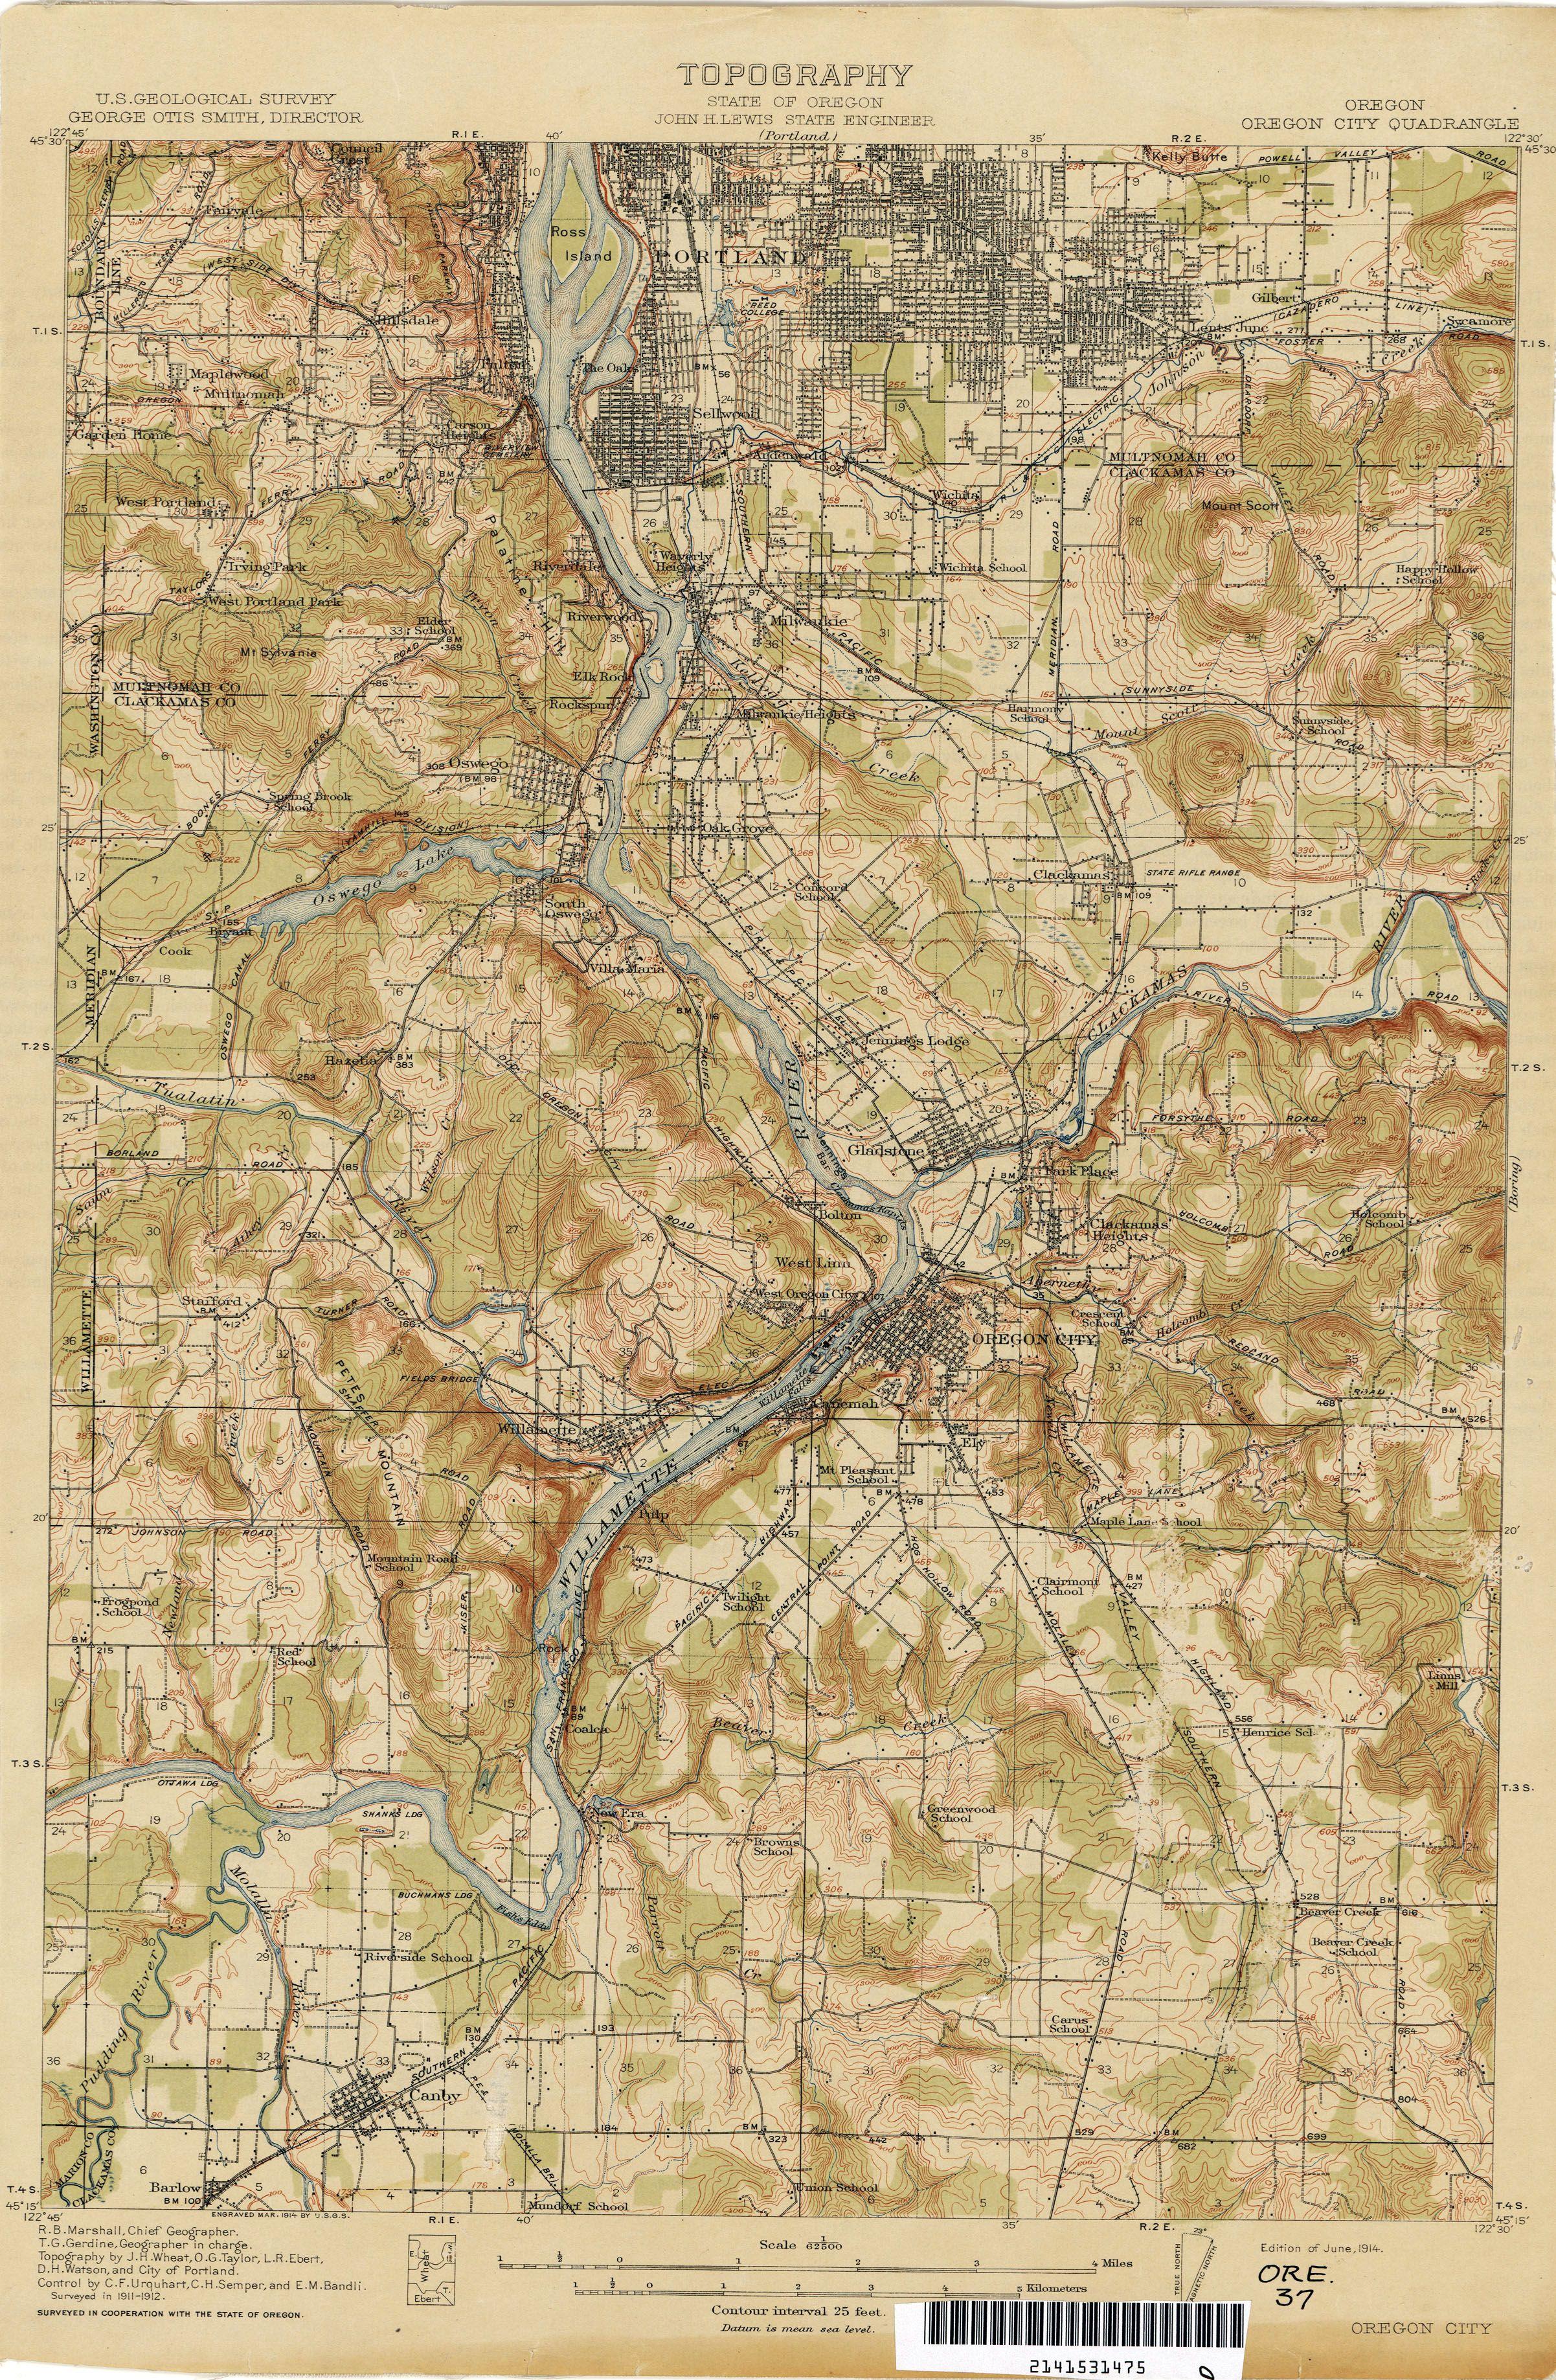 txupclmapstopoororegoncity1912jpg 24033675 Maps Pinterest